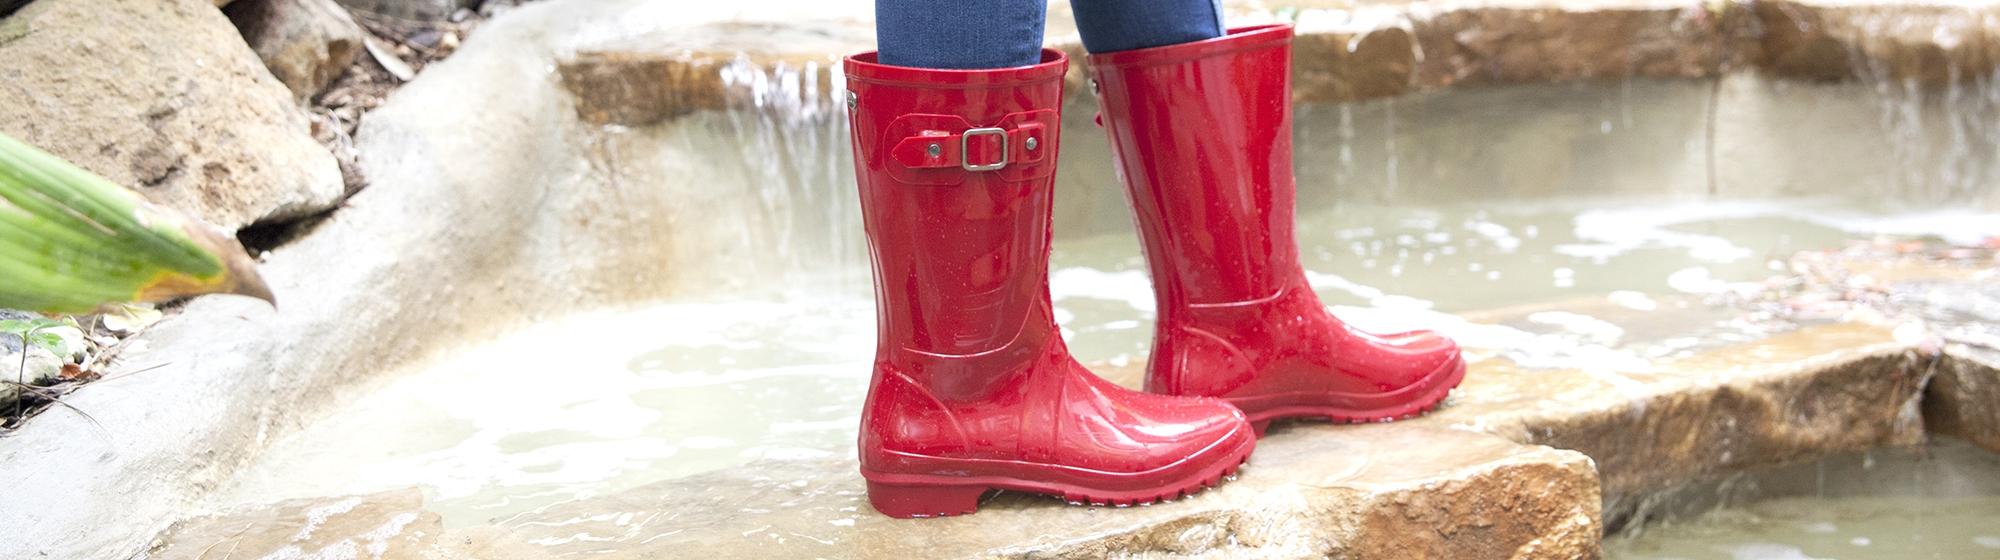 f279dedbe Botas de Agua para Mujer. Zapatos online baratos